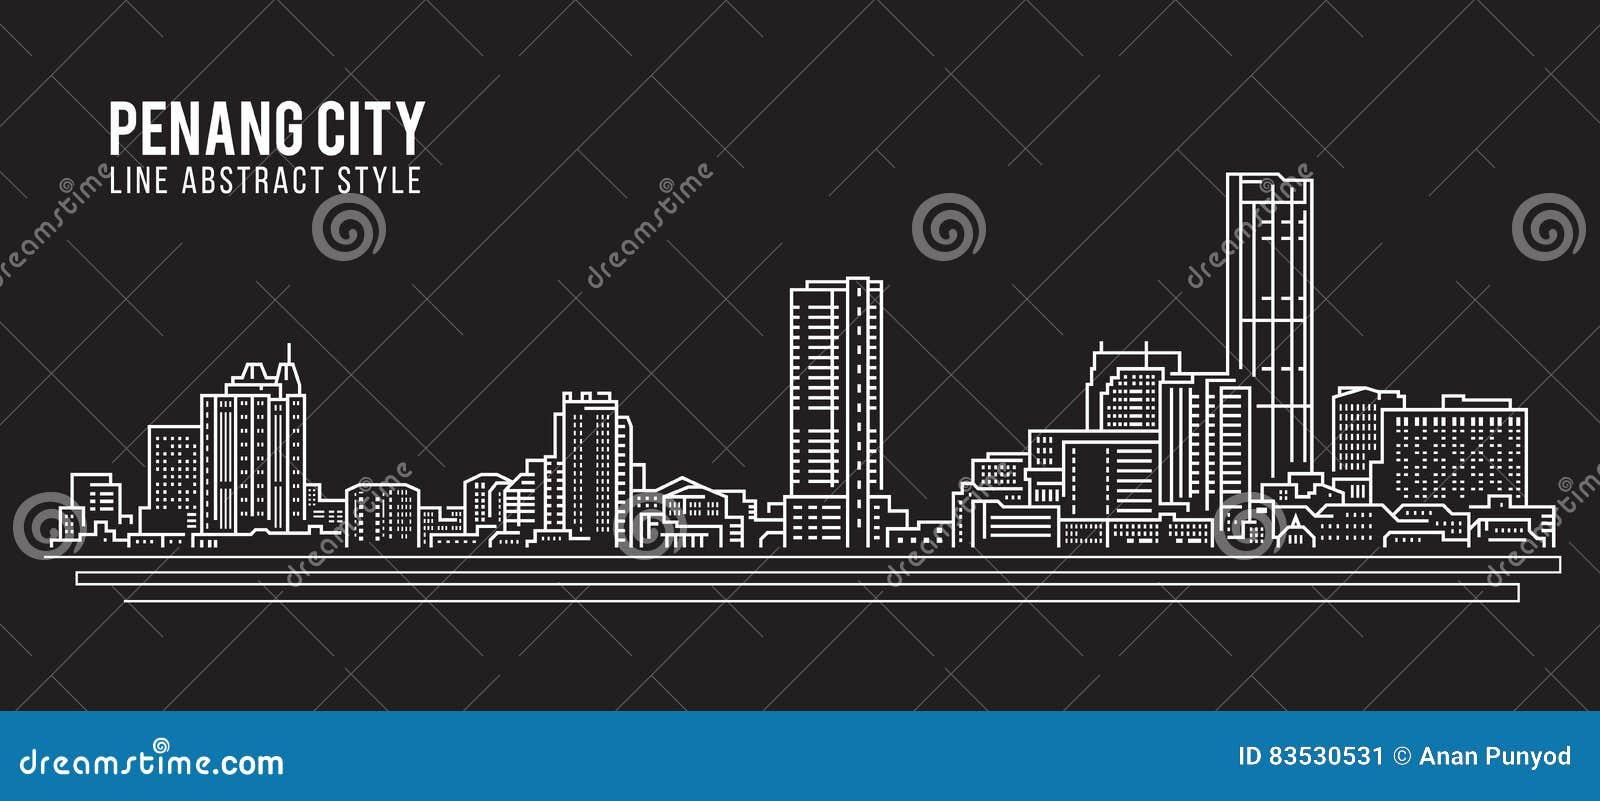 Line Art City : Cityscape building line art vector illustration design penang